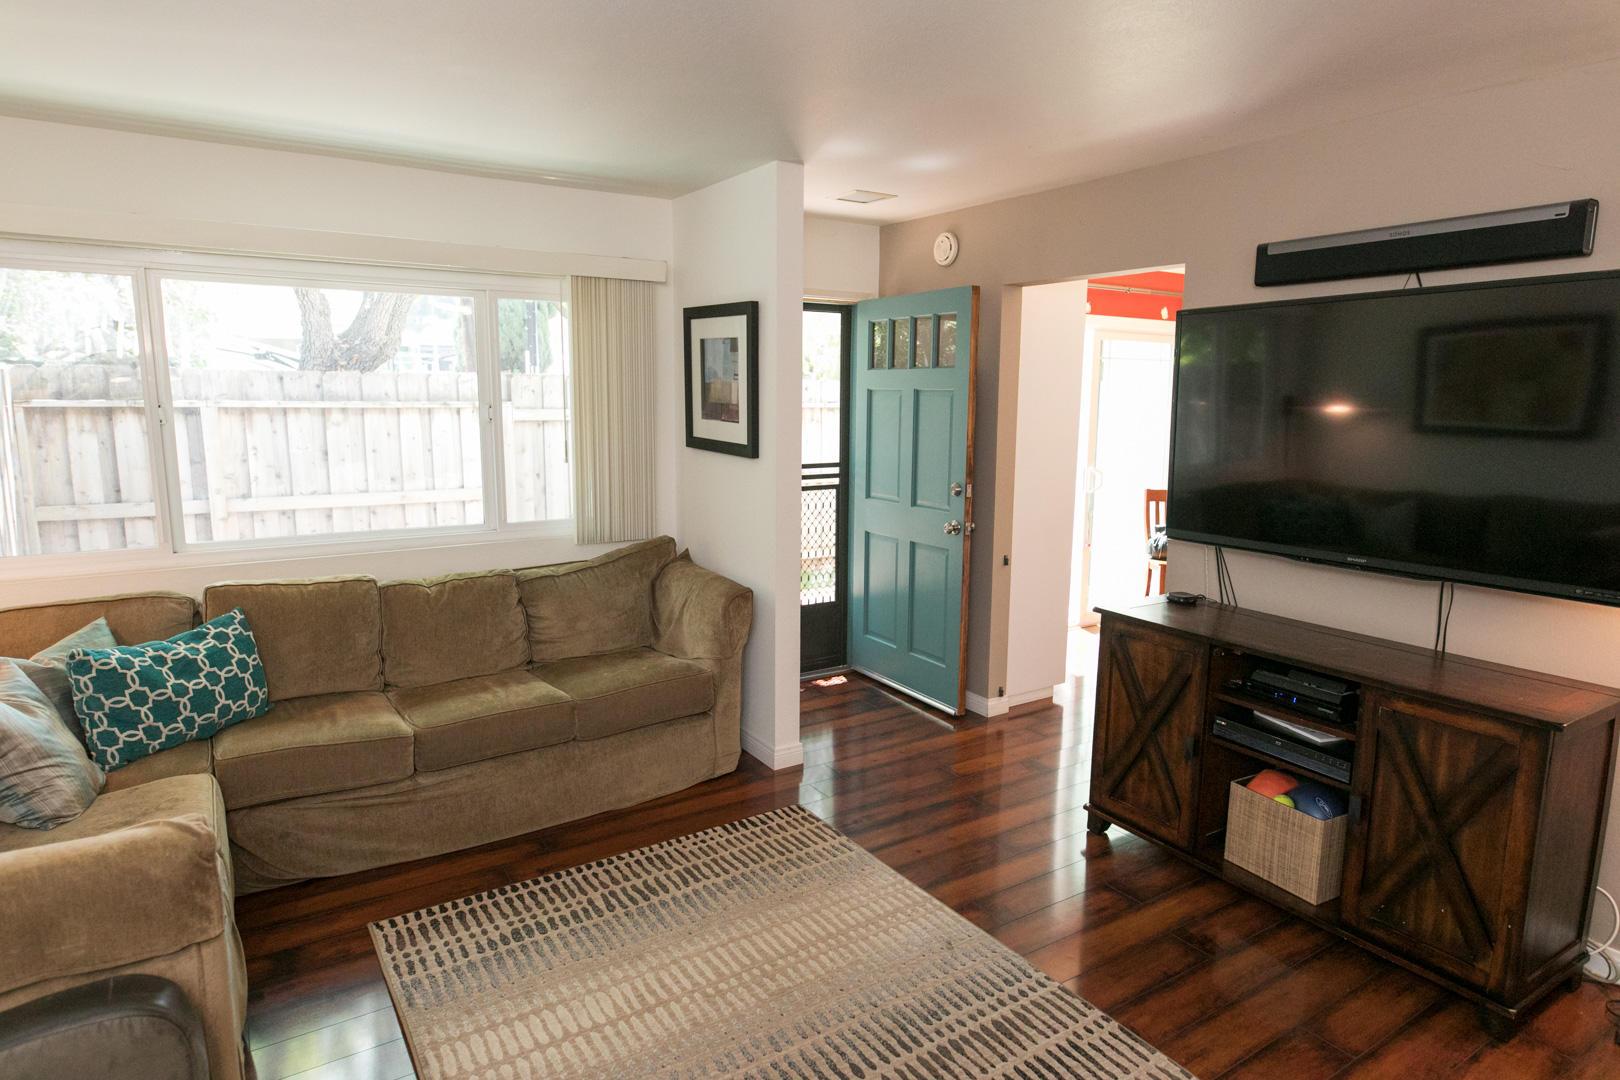 199 N Kellogg Ave, Santa Barbara in Santa Barbara County, CA 93111 Home for Sale